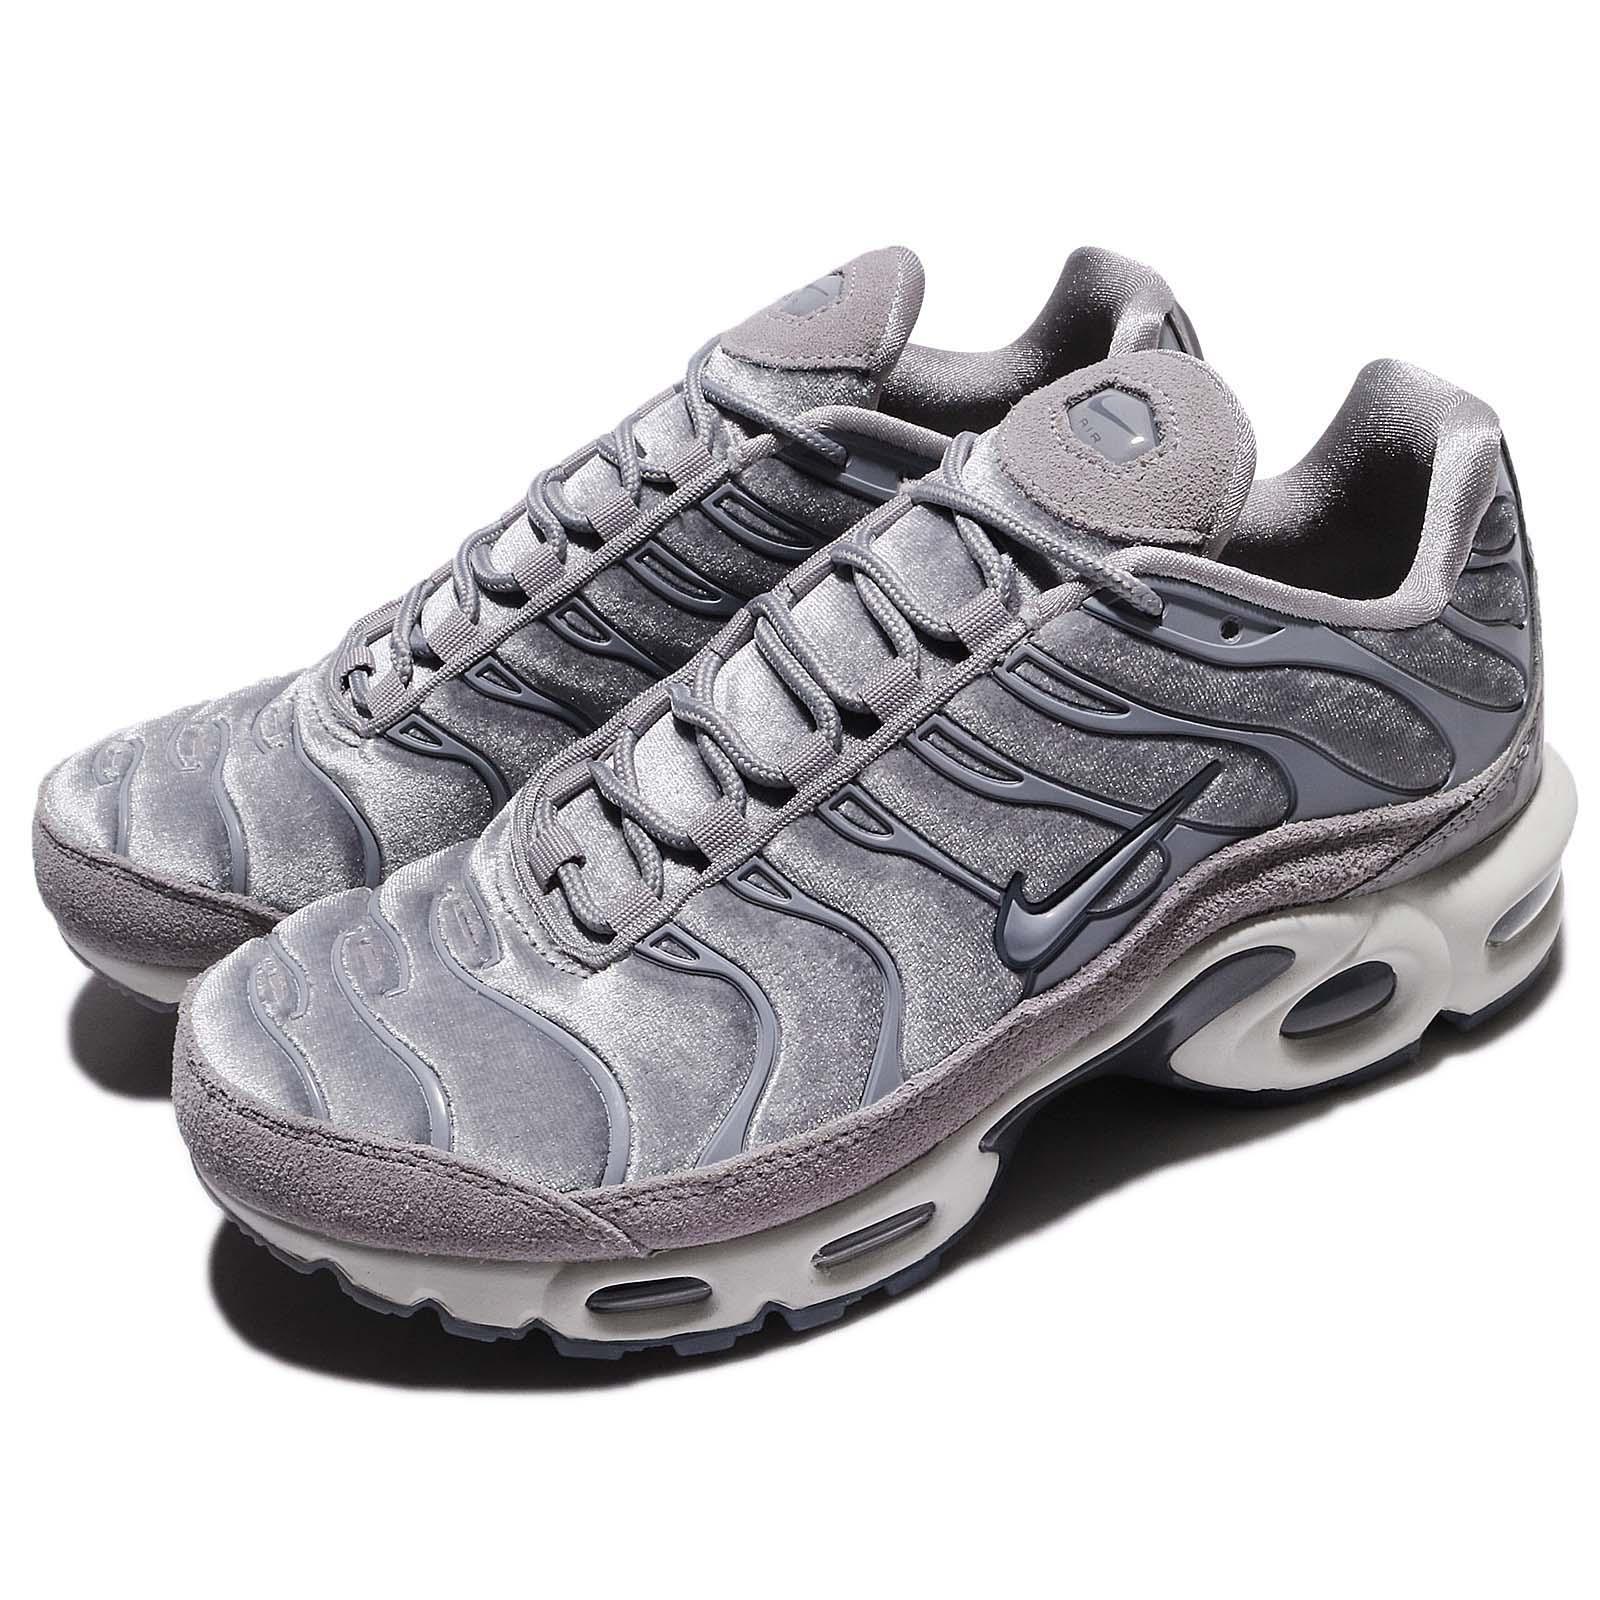 4d2ac6e661 Details about Nike Wmns Air Max Plus LX Lux Gunsmoke Grey Women Running  Shoes AH6788-001